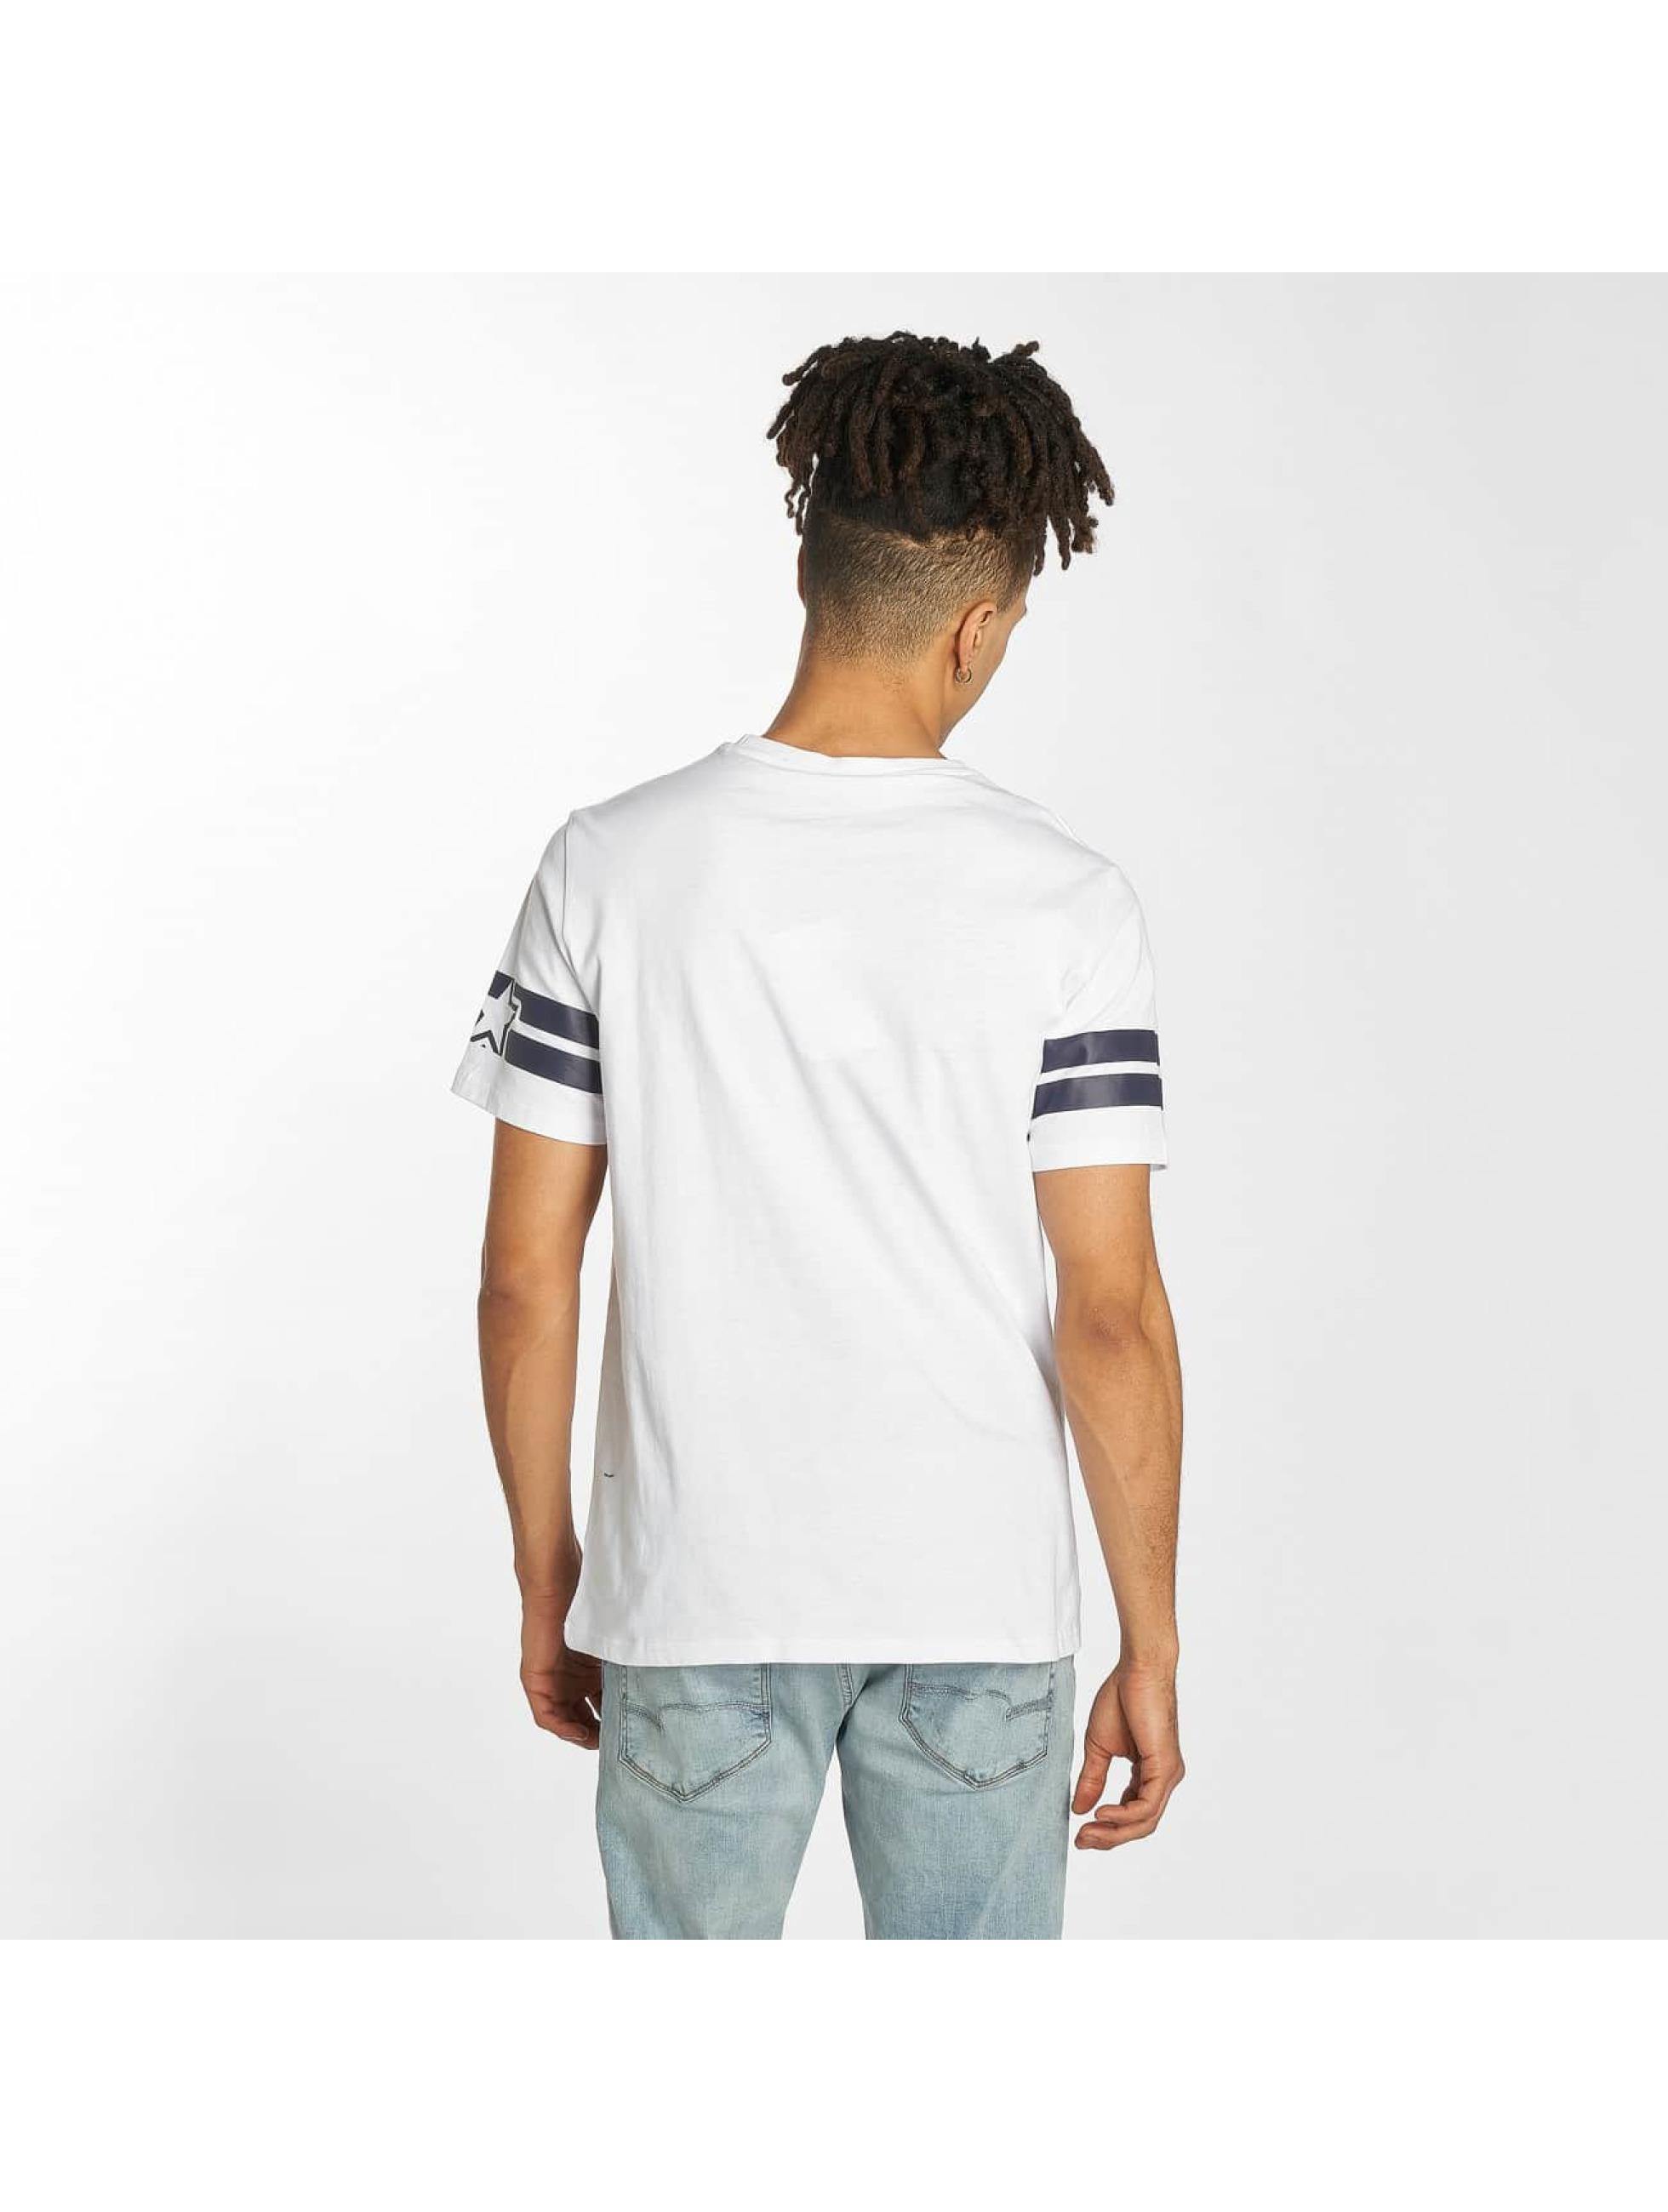 Starter Camiseta Cracraft blanco